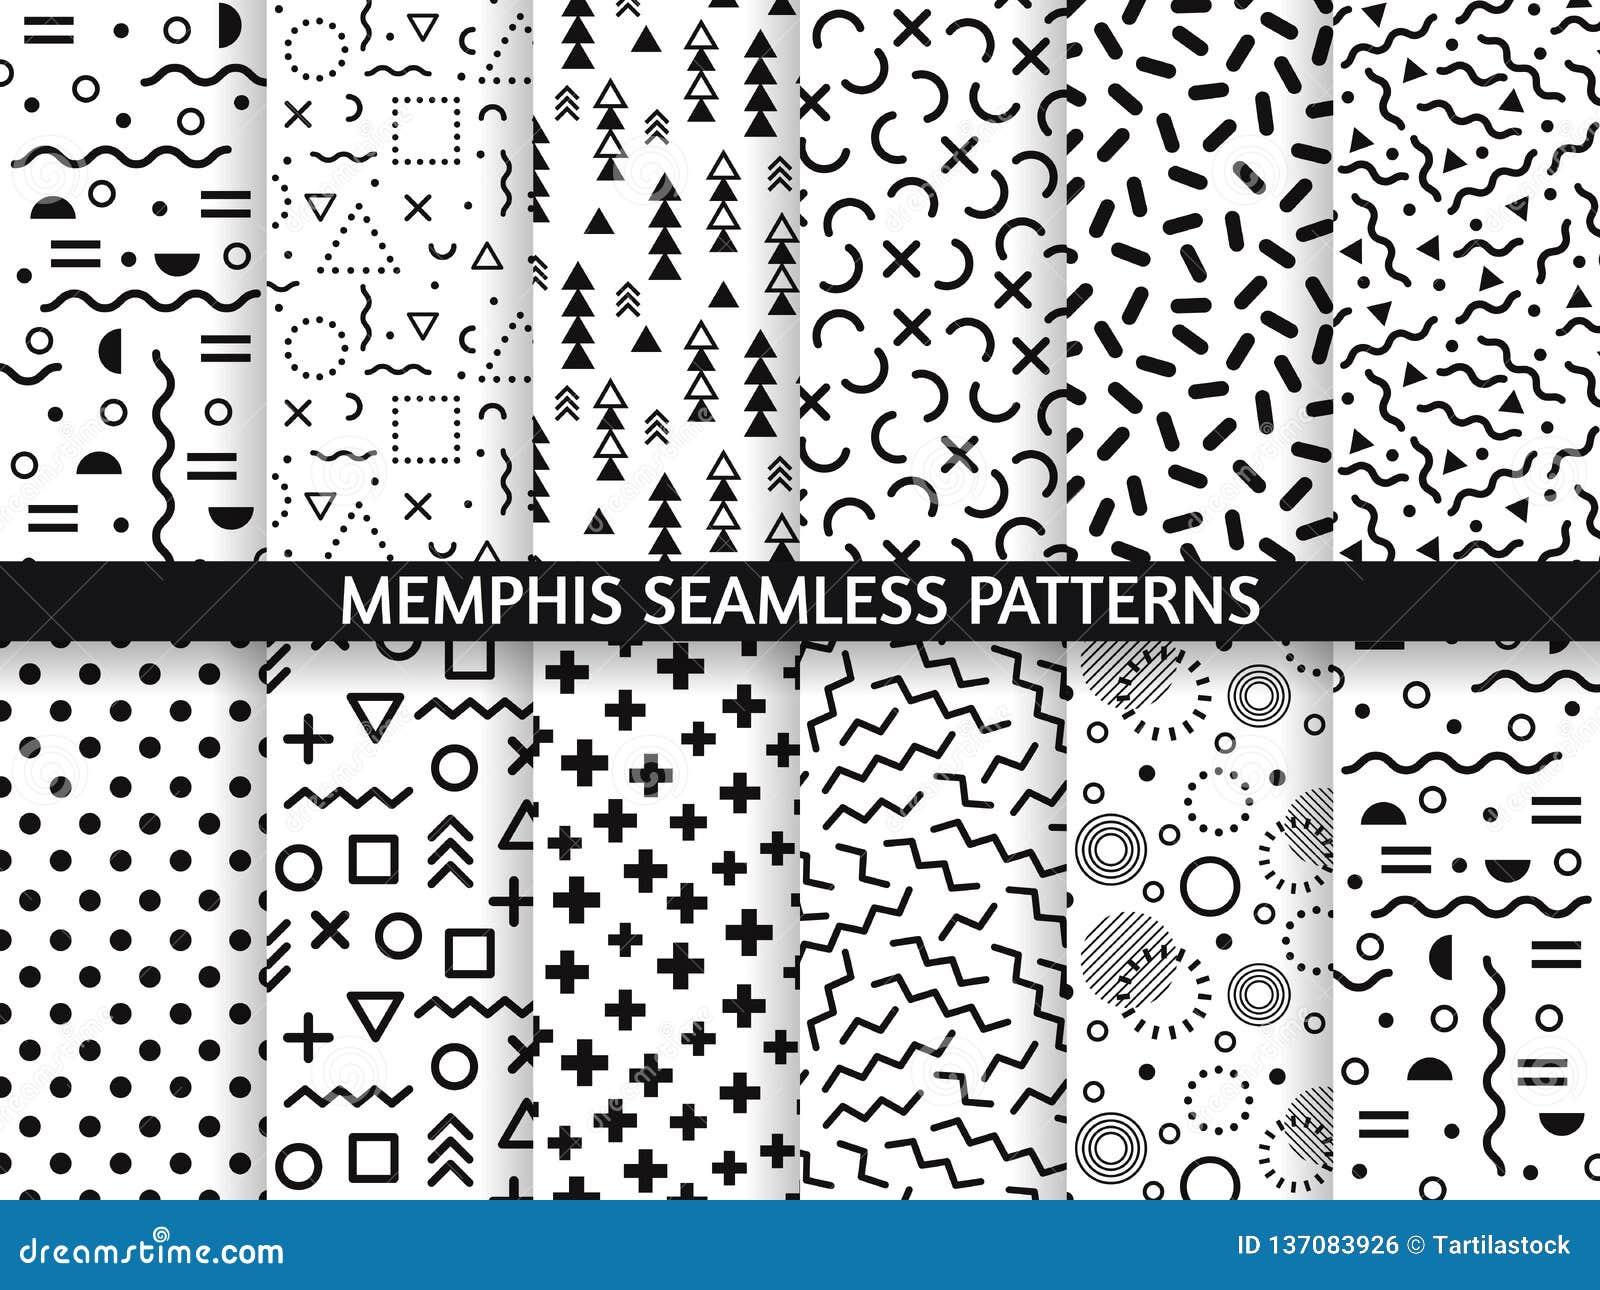 Memphis Seamless Patterns  Funky Pattern, Retro Fashion 80s